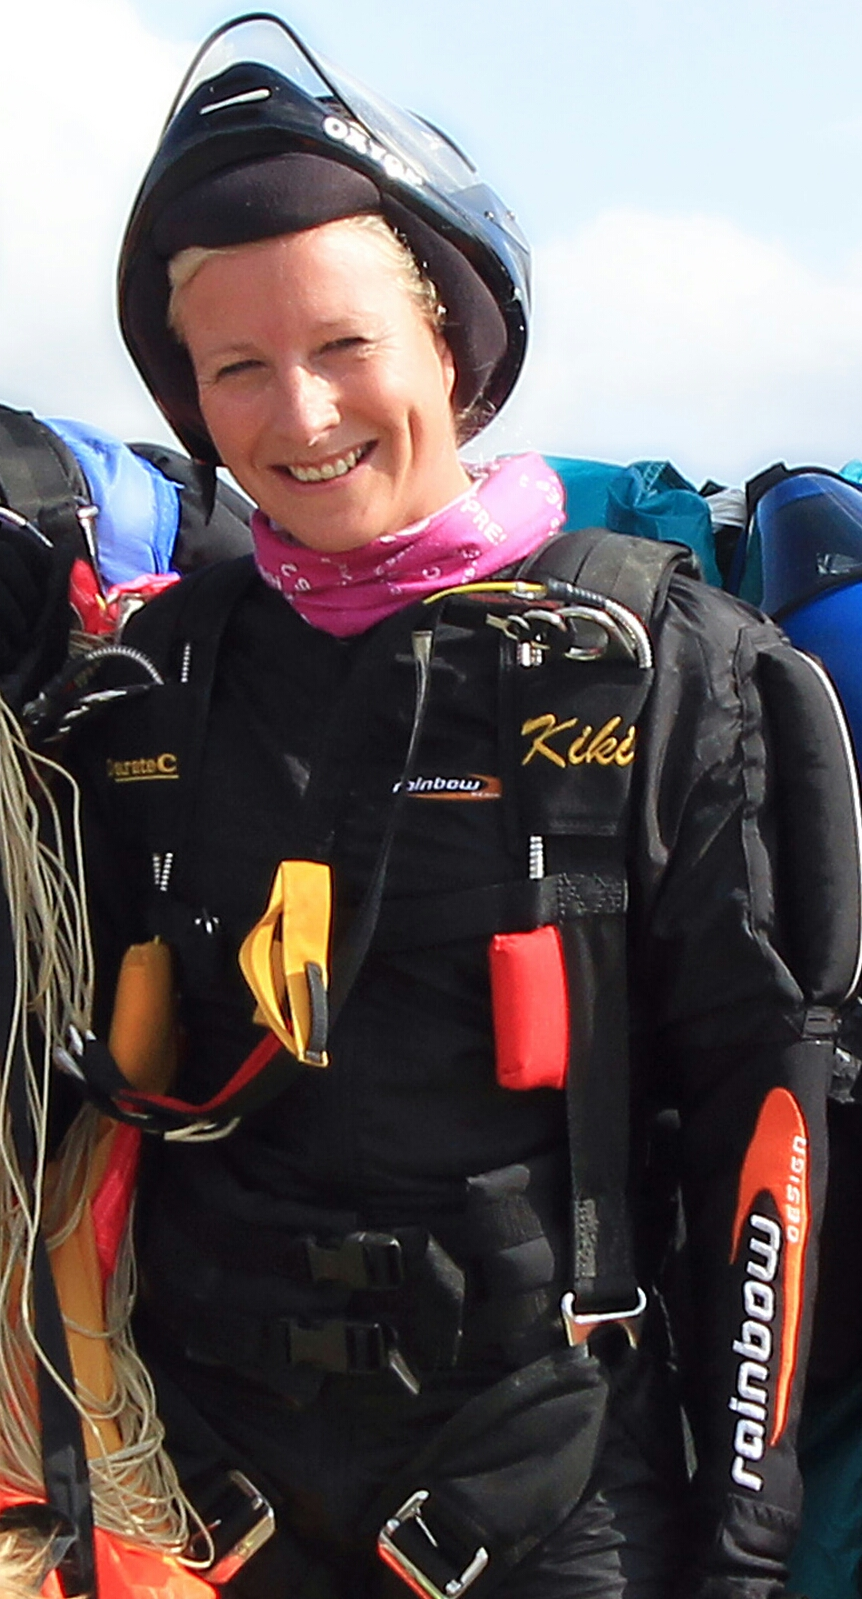 Kristin Kühne